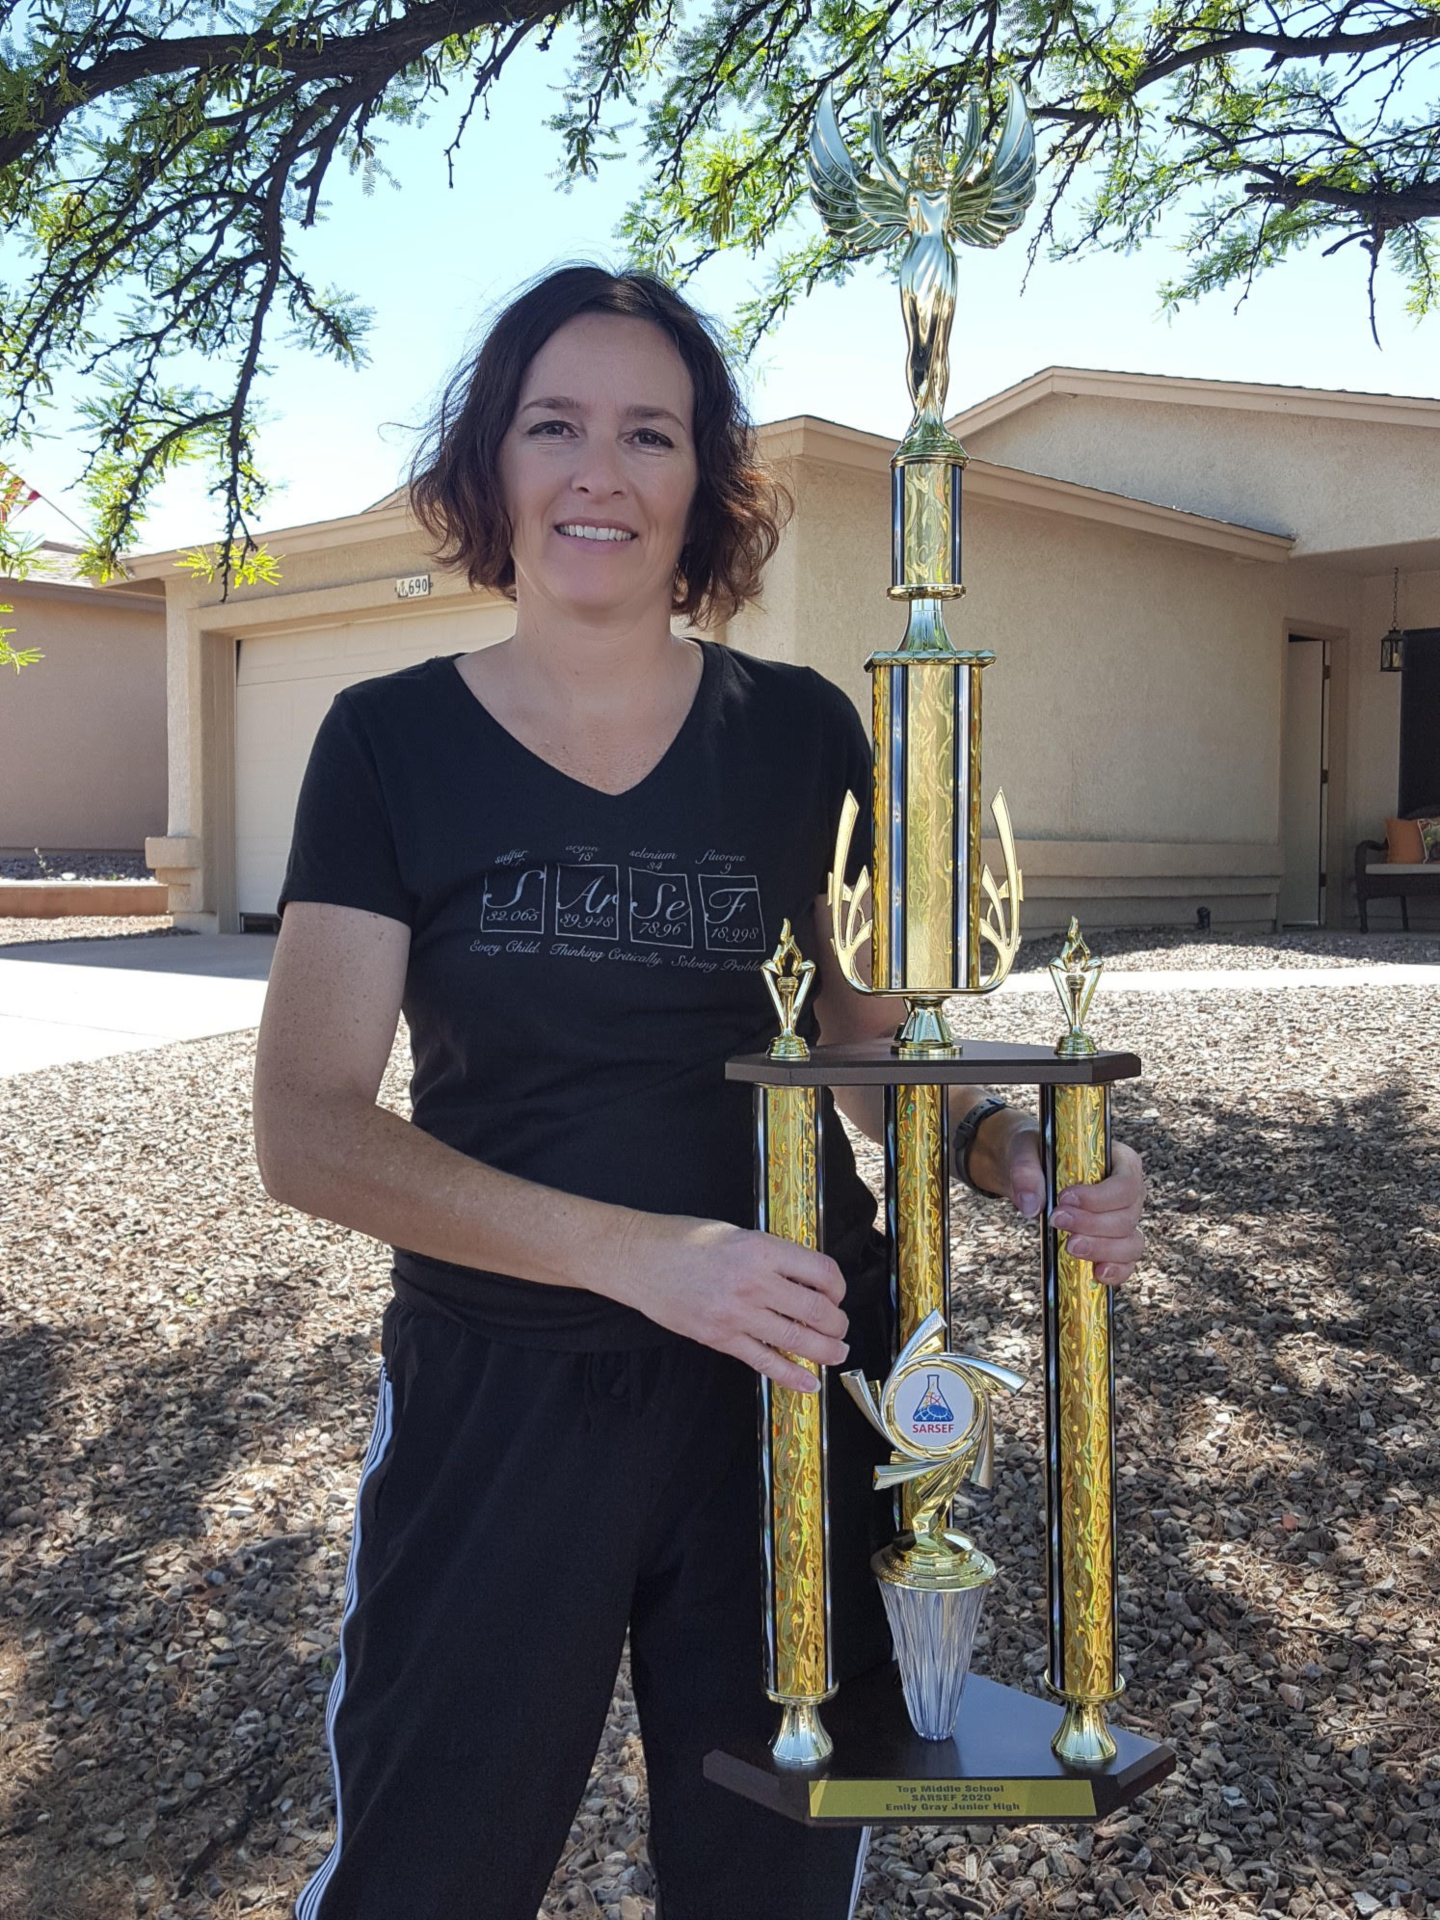 Lara Huetter w/trophy photo